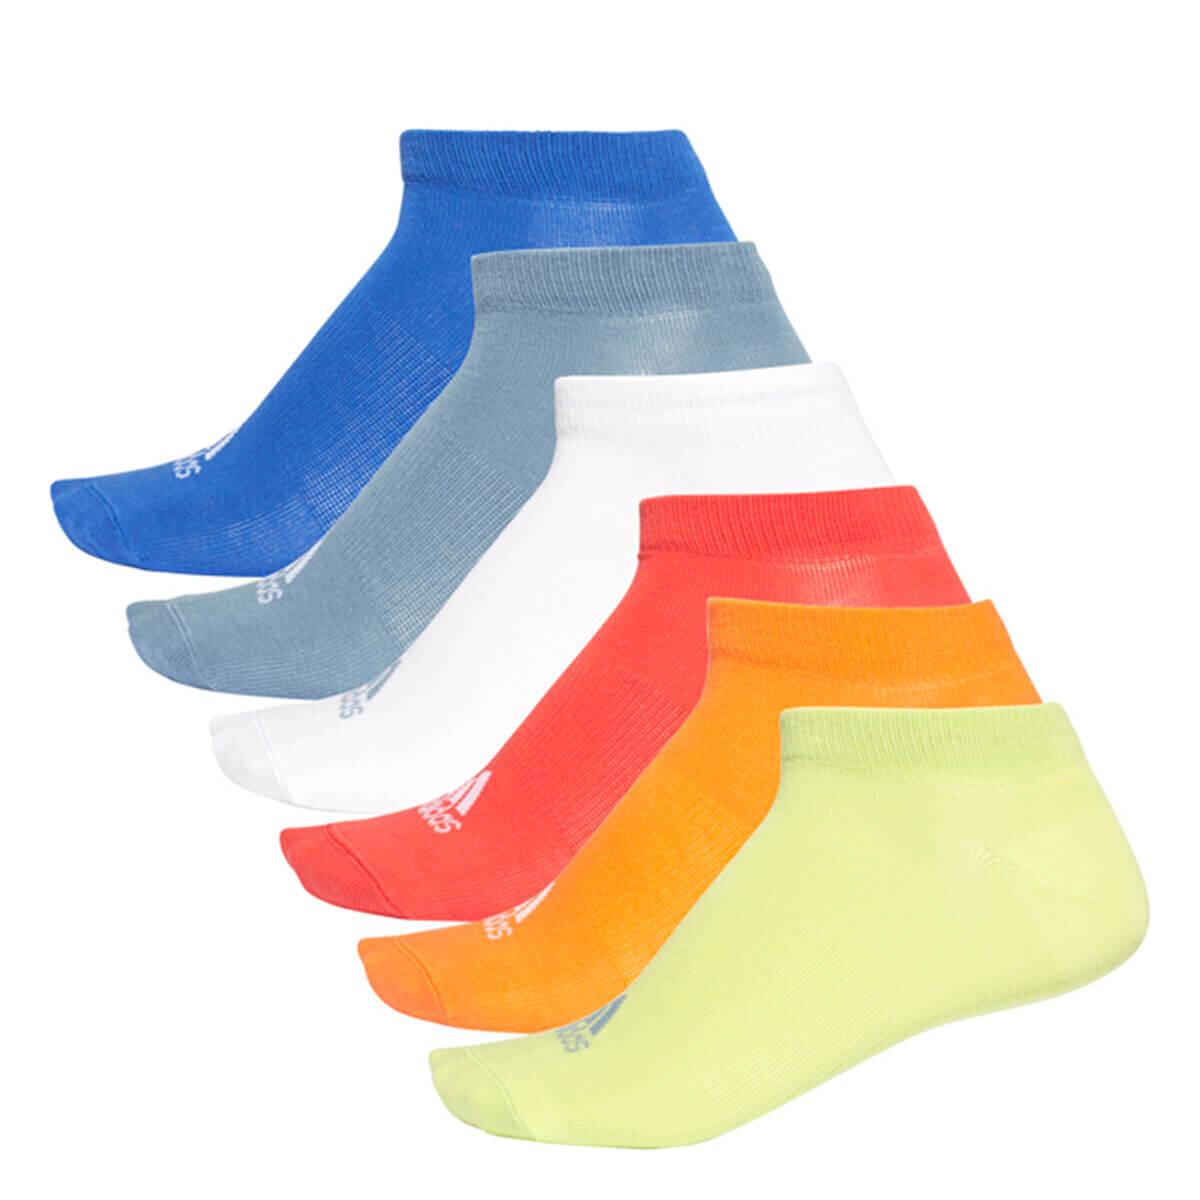 Çok Renkli Unisex Çorap PER NO-SH T 6PP